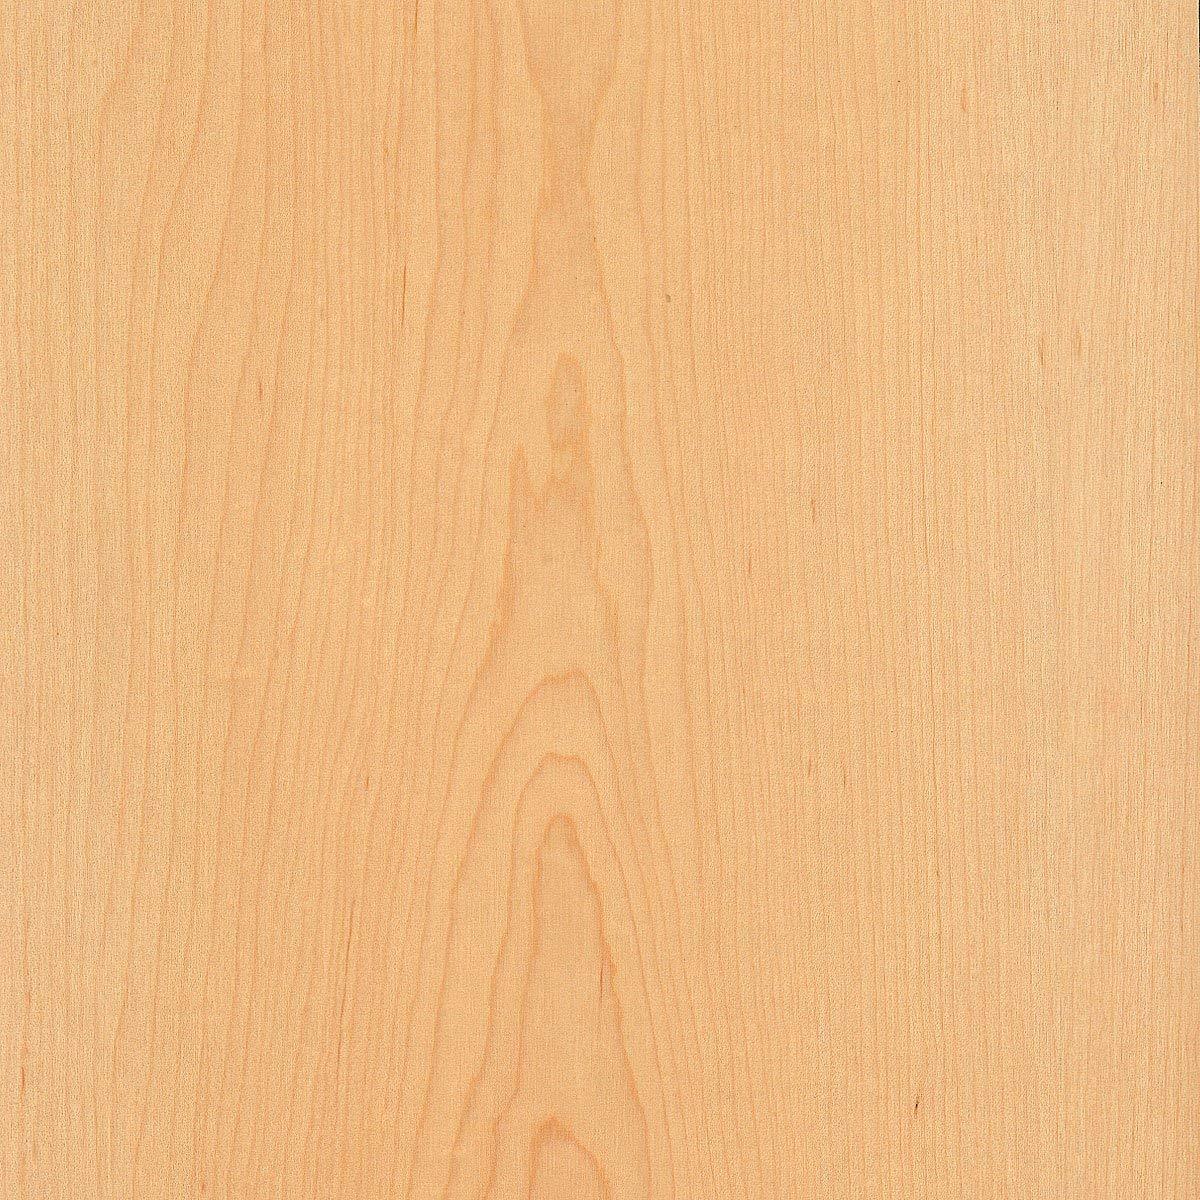 2440 x 1220 x 18mm Maple / Maple MDF